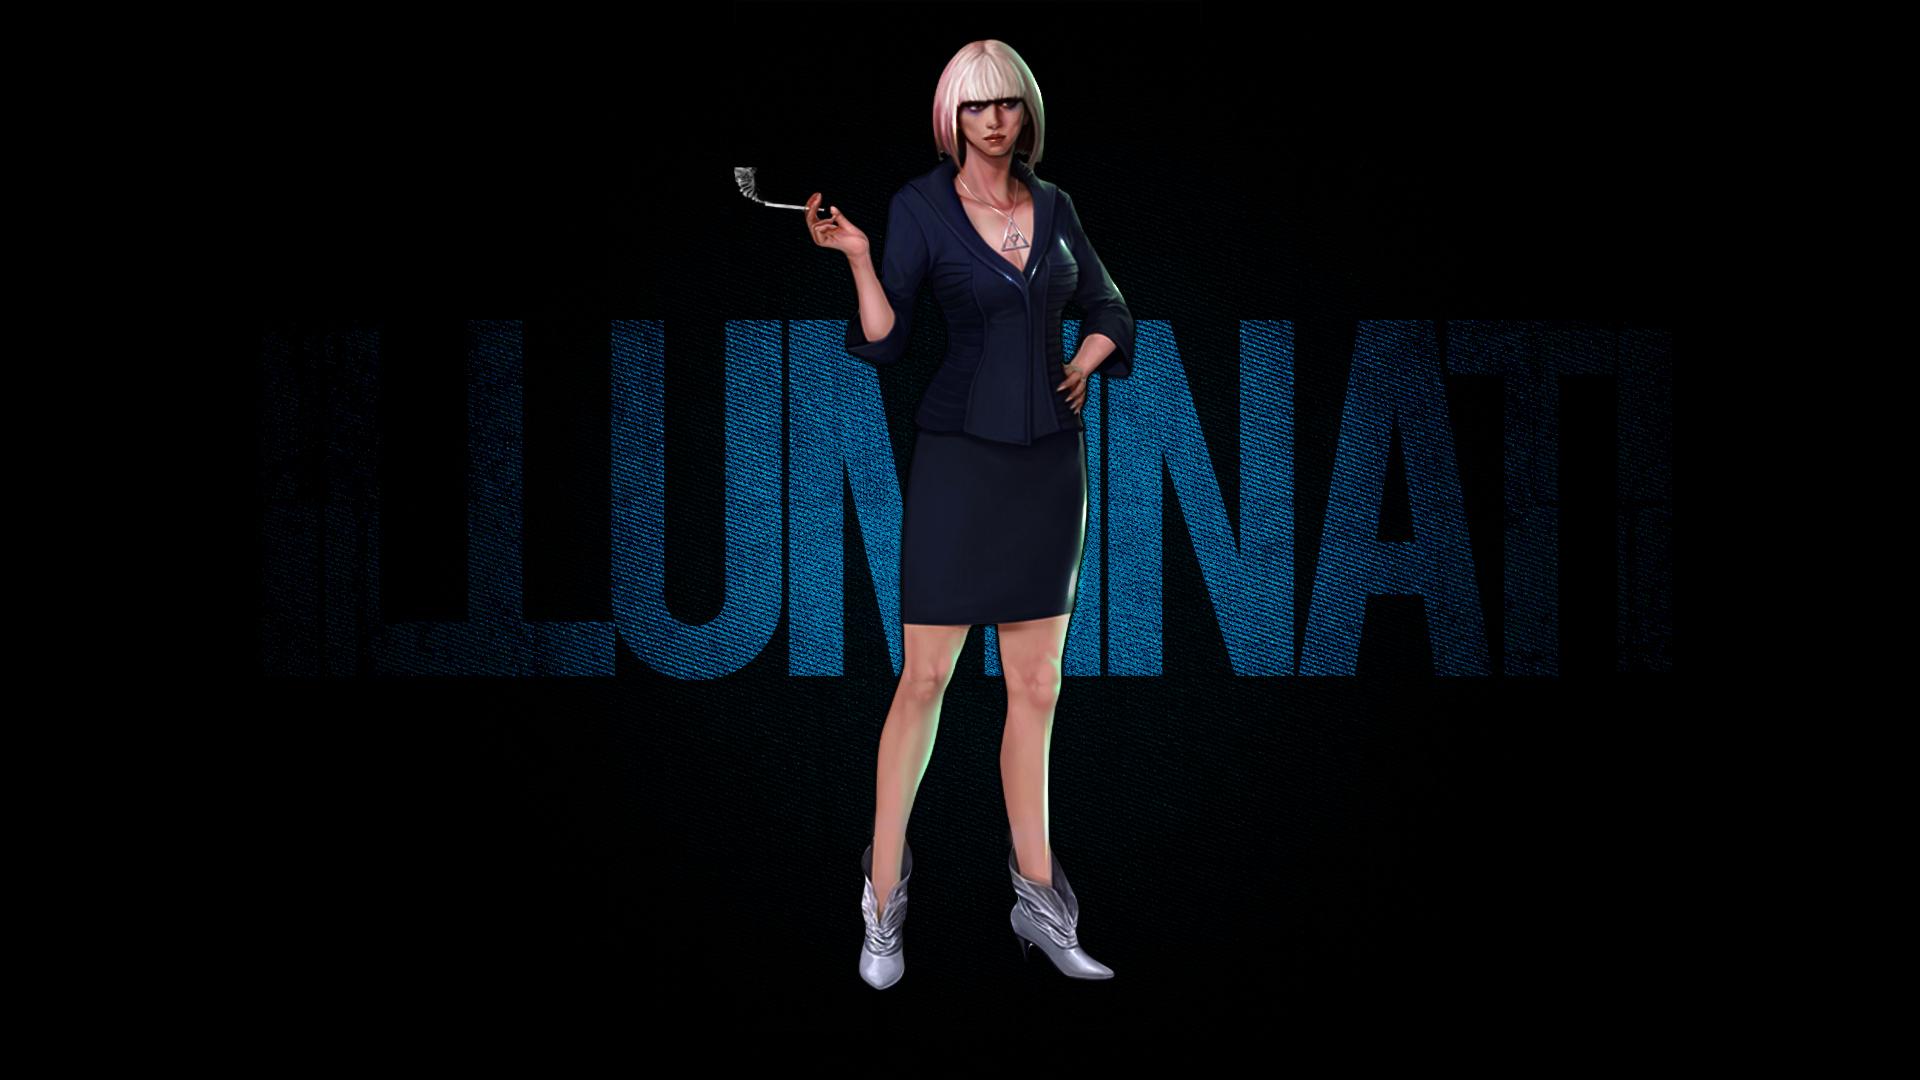 Illuminati Kristen Geary The Secret World Hd By Blacklotusxx